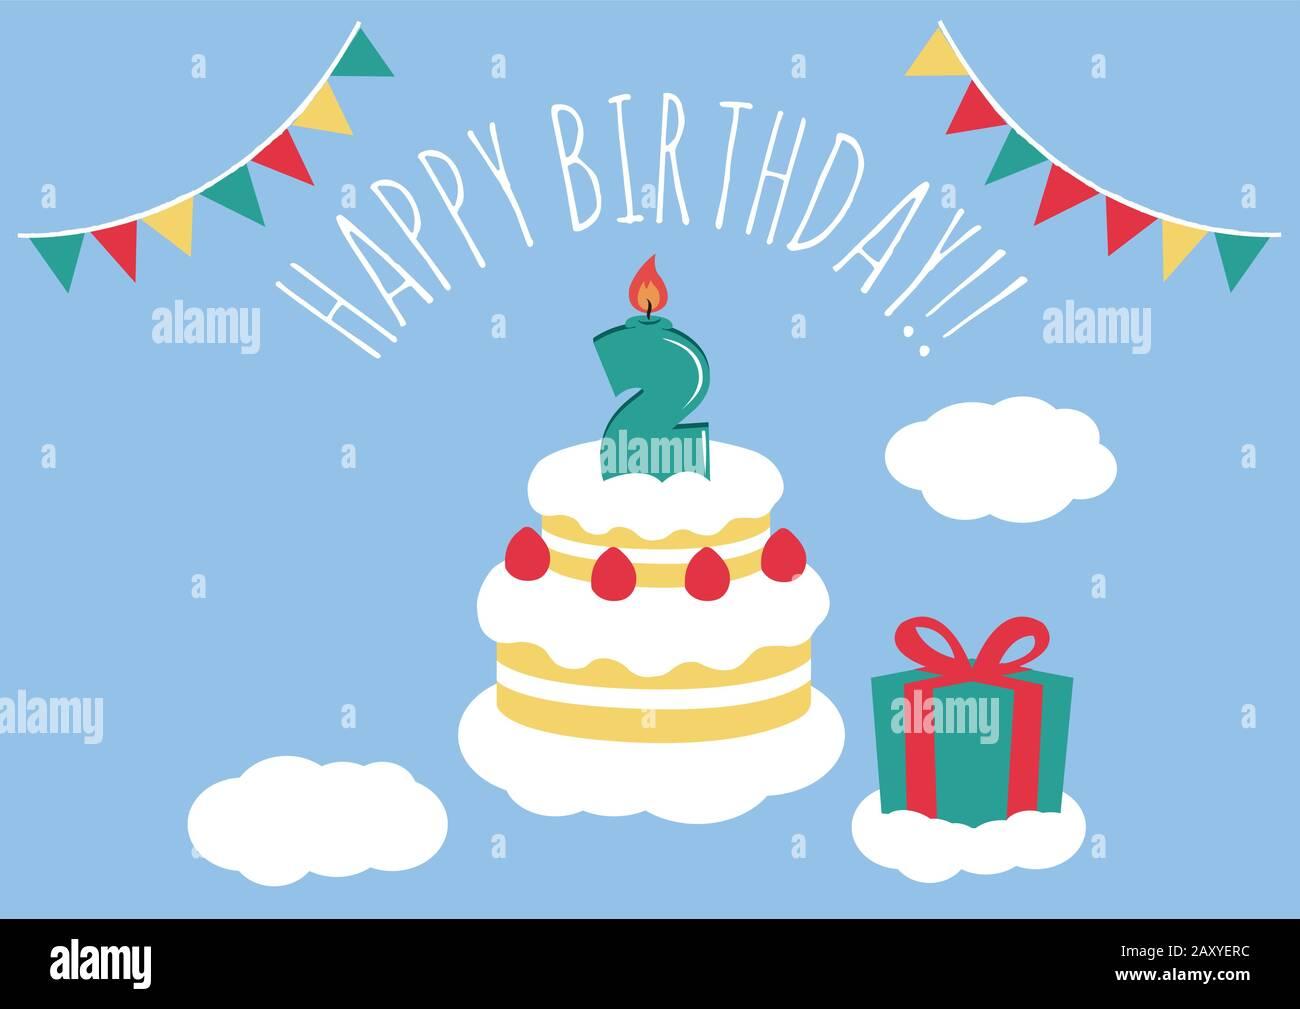 Pleasing Birthday Card Invitation Greeting Birthday Cake Illustratio 2 Funny Birthday Cards Online Hendilapandamsfinfo